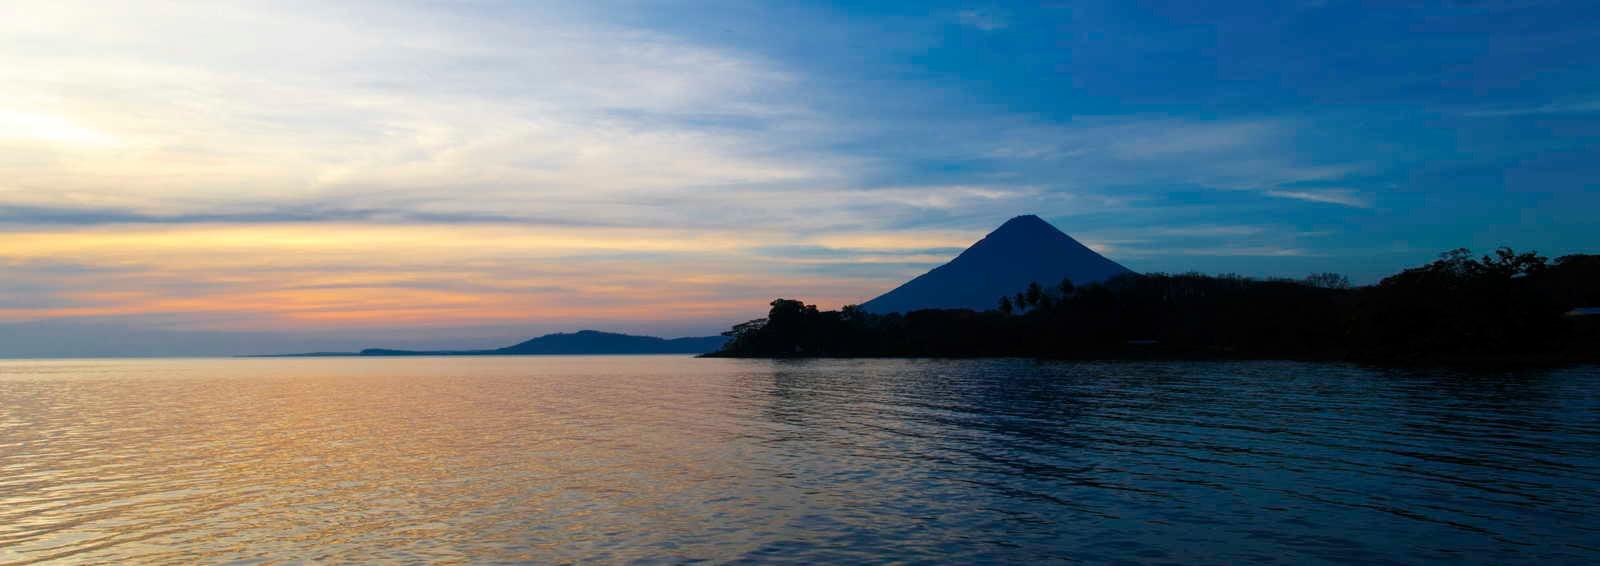 Conception Volcano, Ometepe Iland, Nicaragua